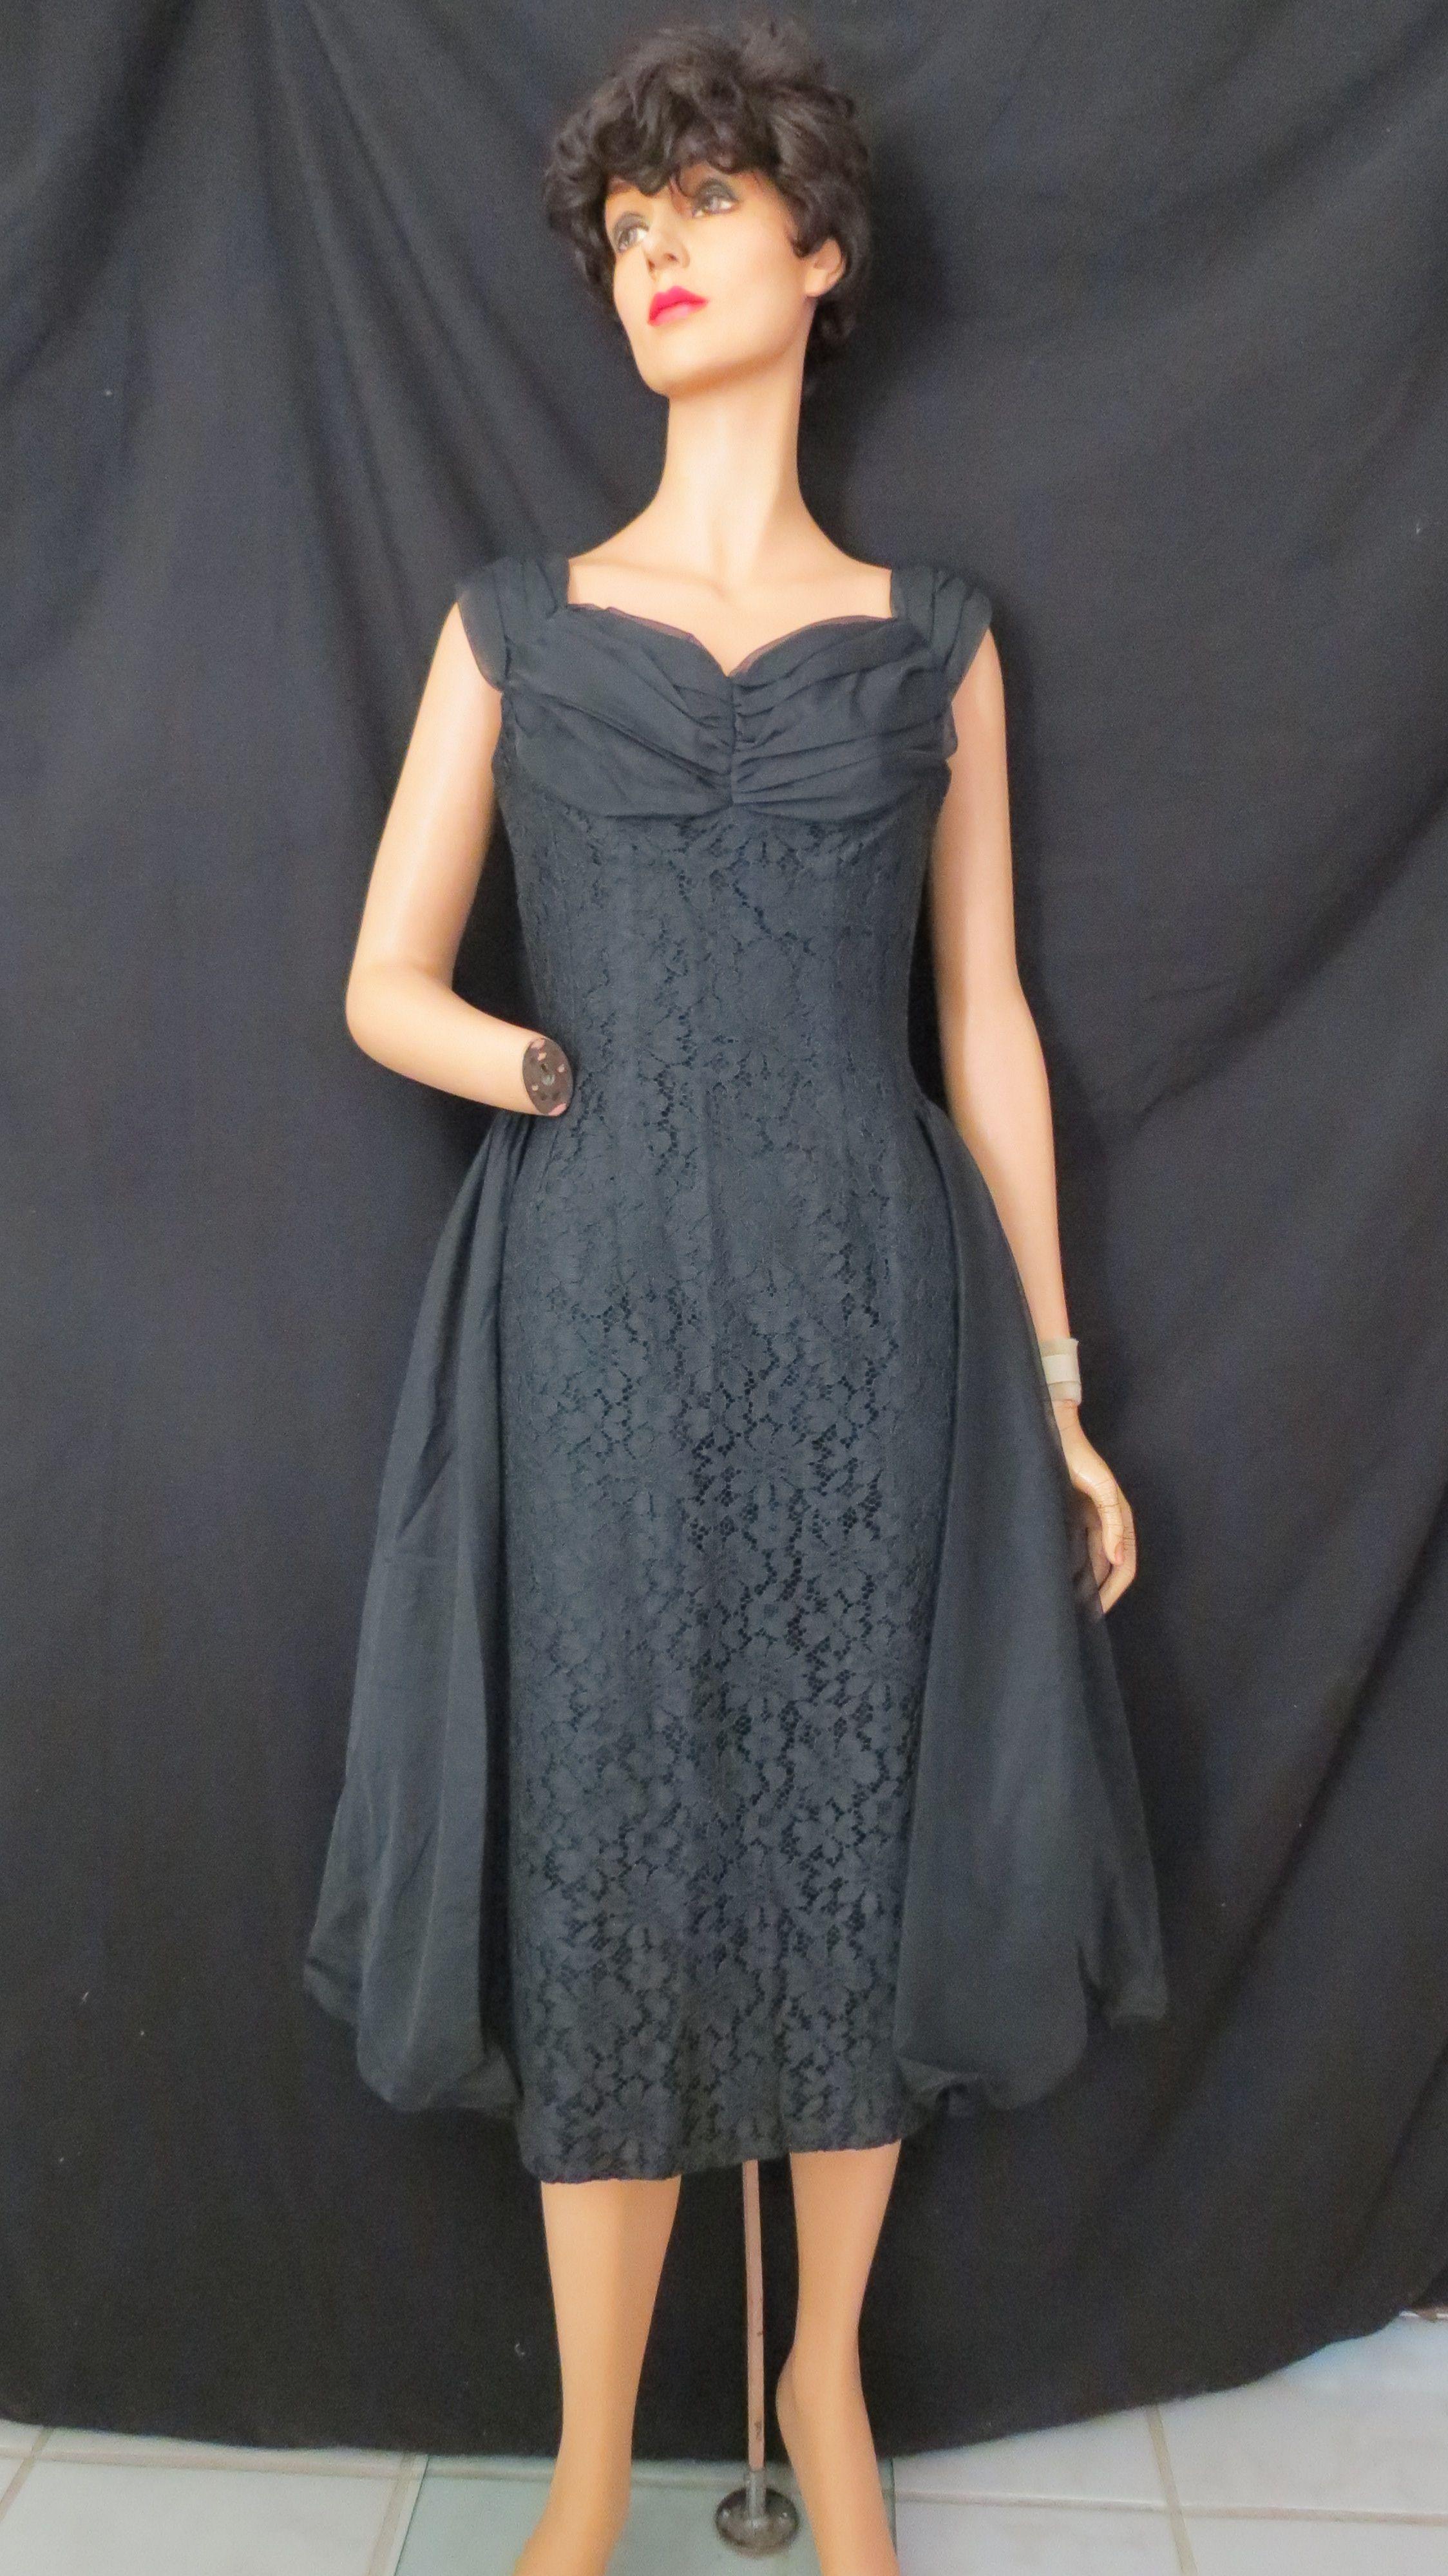 1950 S Early 1960 S Kennedy Era Lbd Cocktail Dress Cocktail Dress Dresses Fashion [ 4000 x 2248 Pixel ]